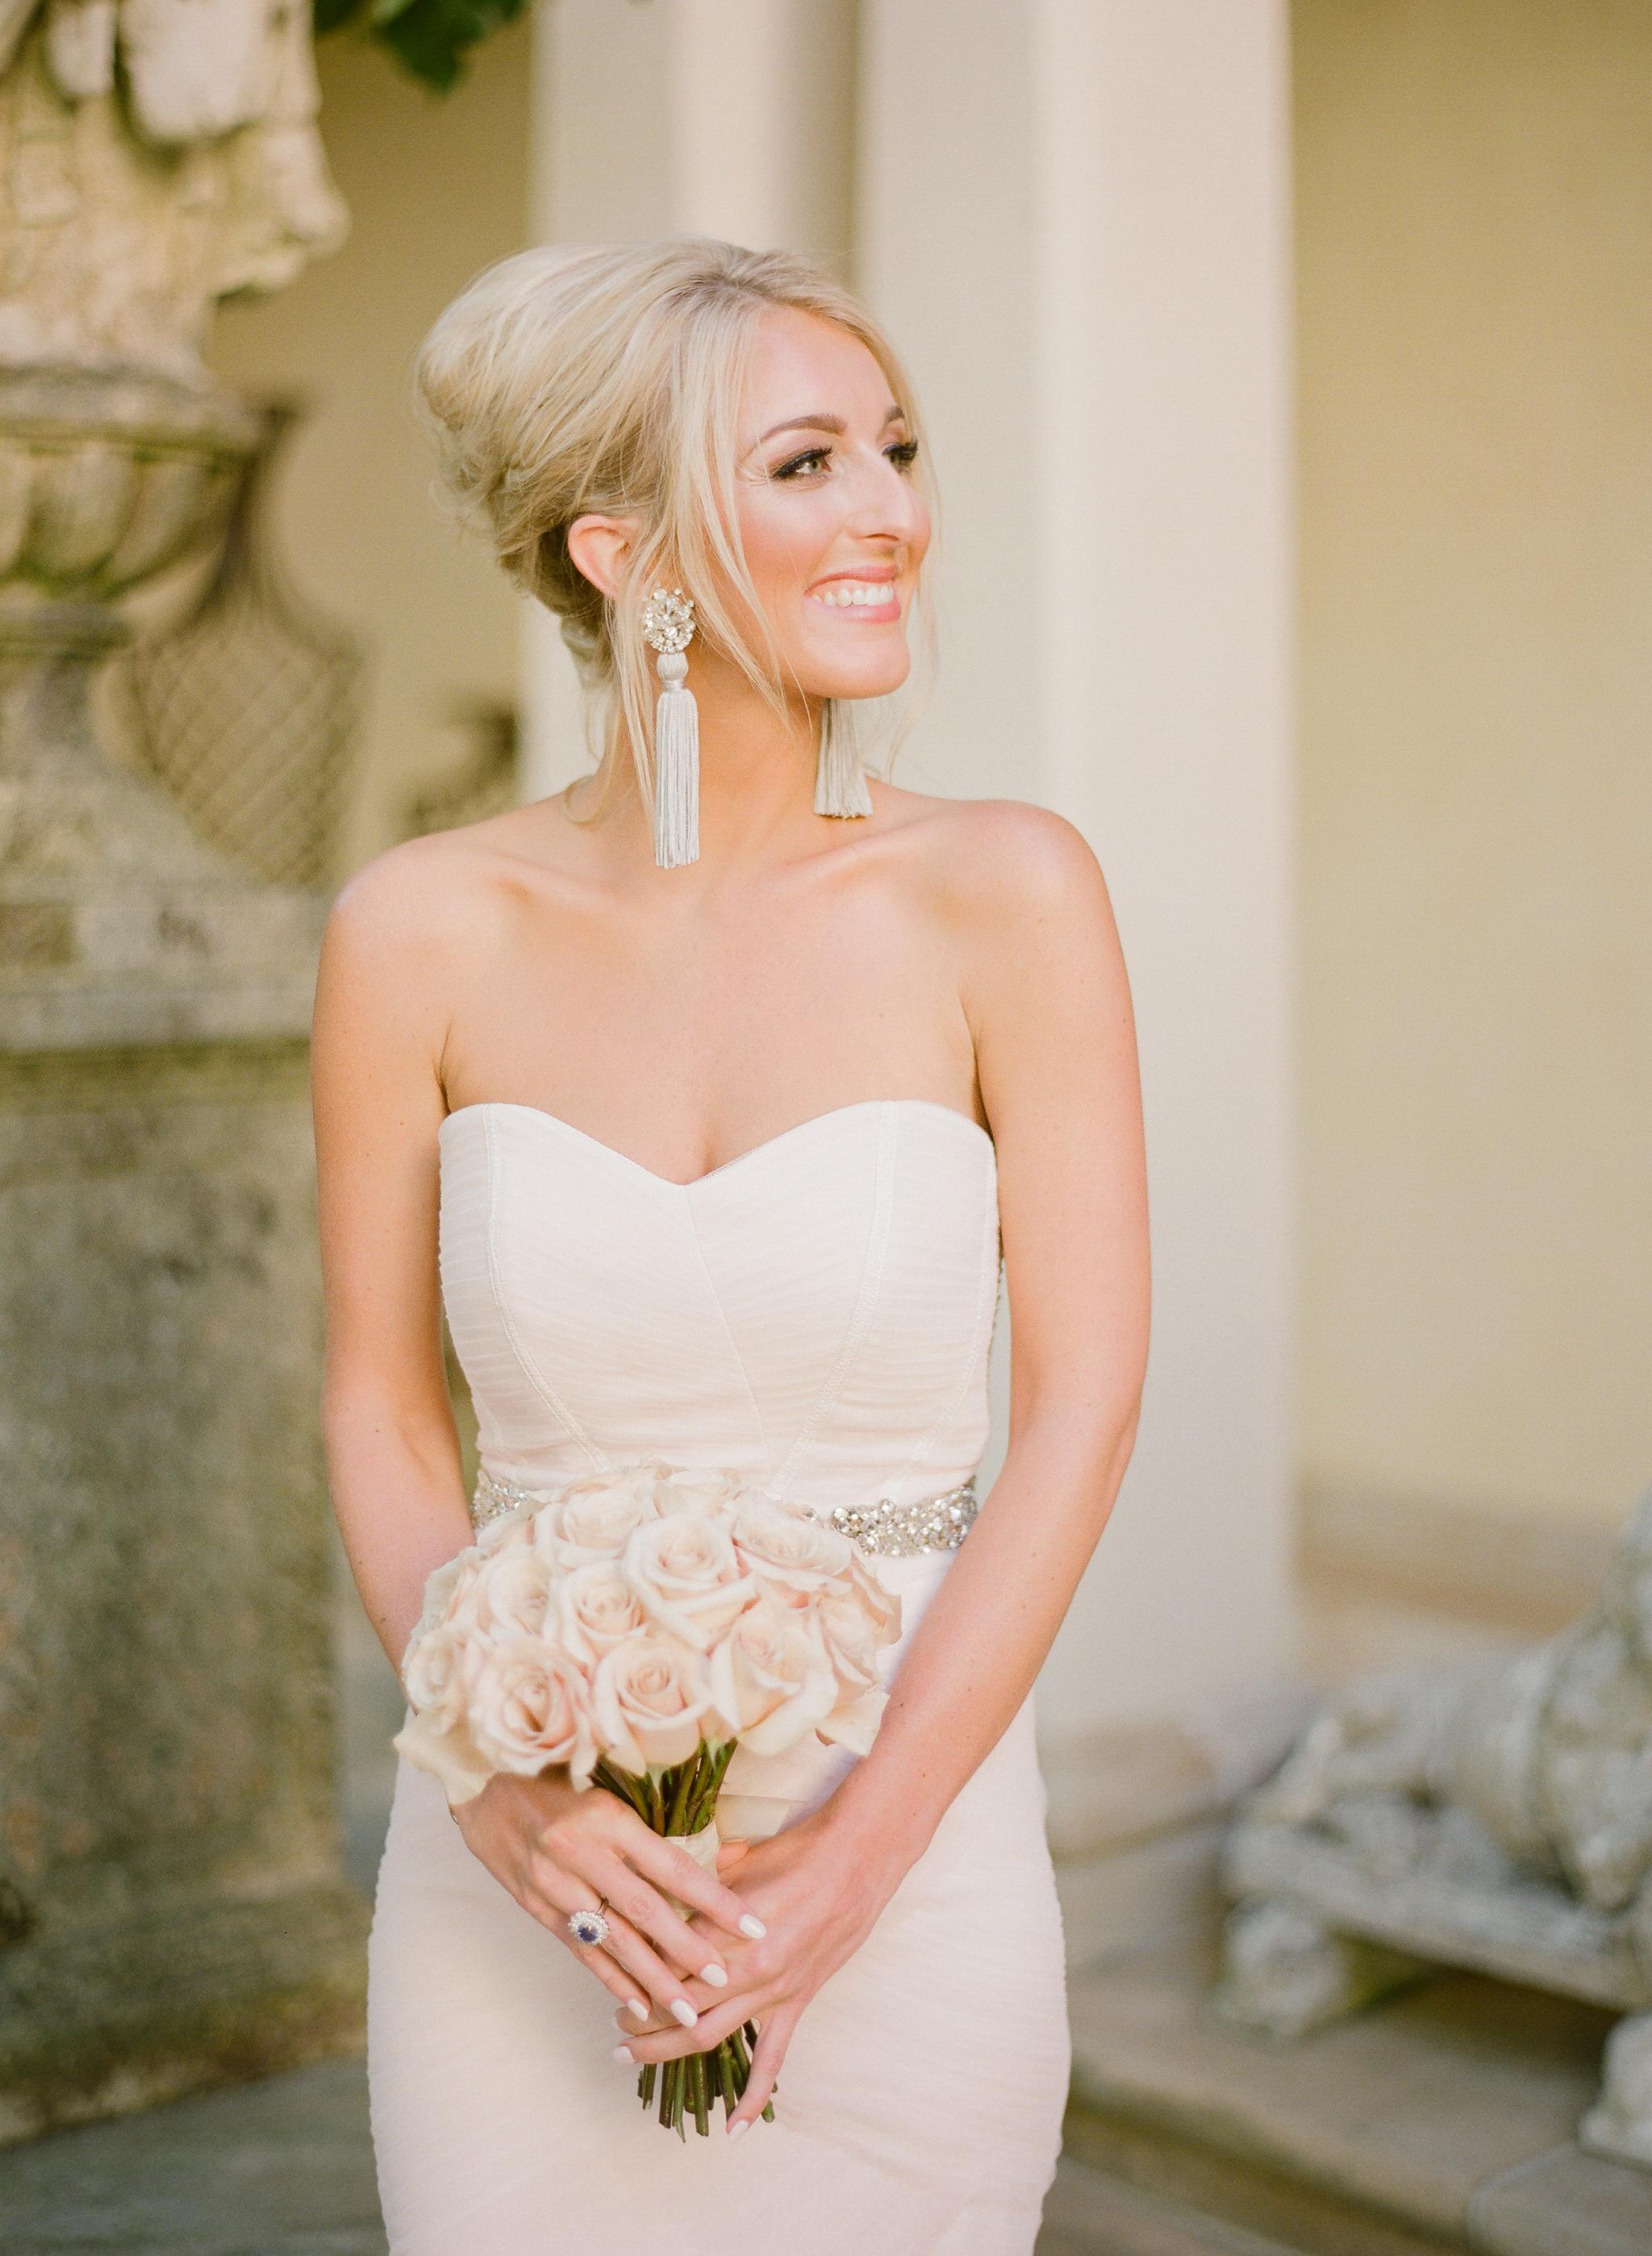 Ceci_New_York_Florida_Wedding_Style_Bride_Watercolor_Real_Custom_Luxury_48.jpg